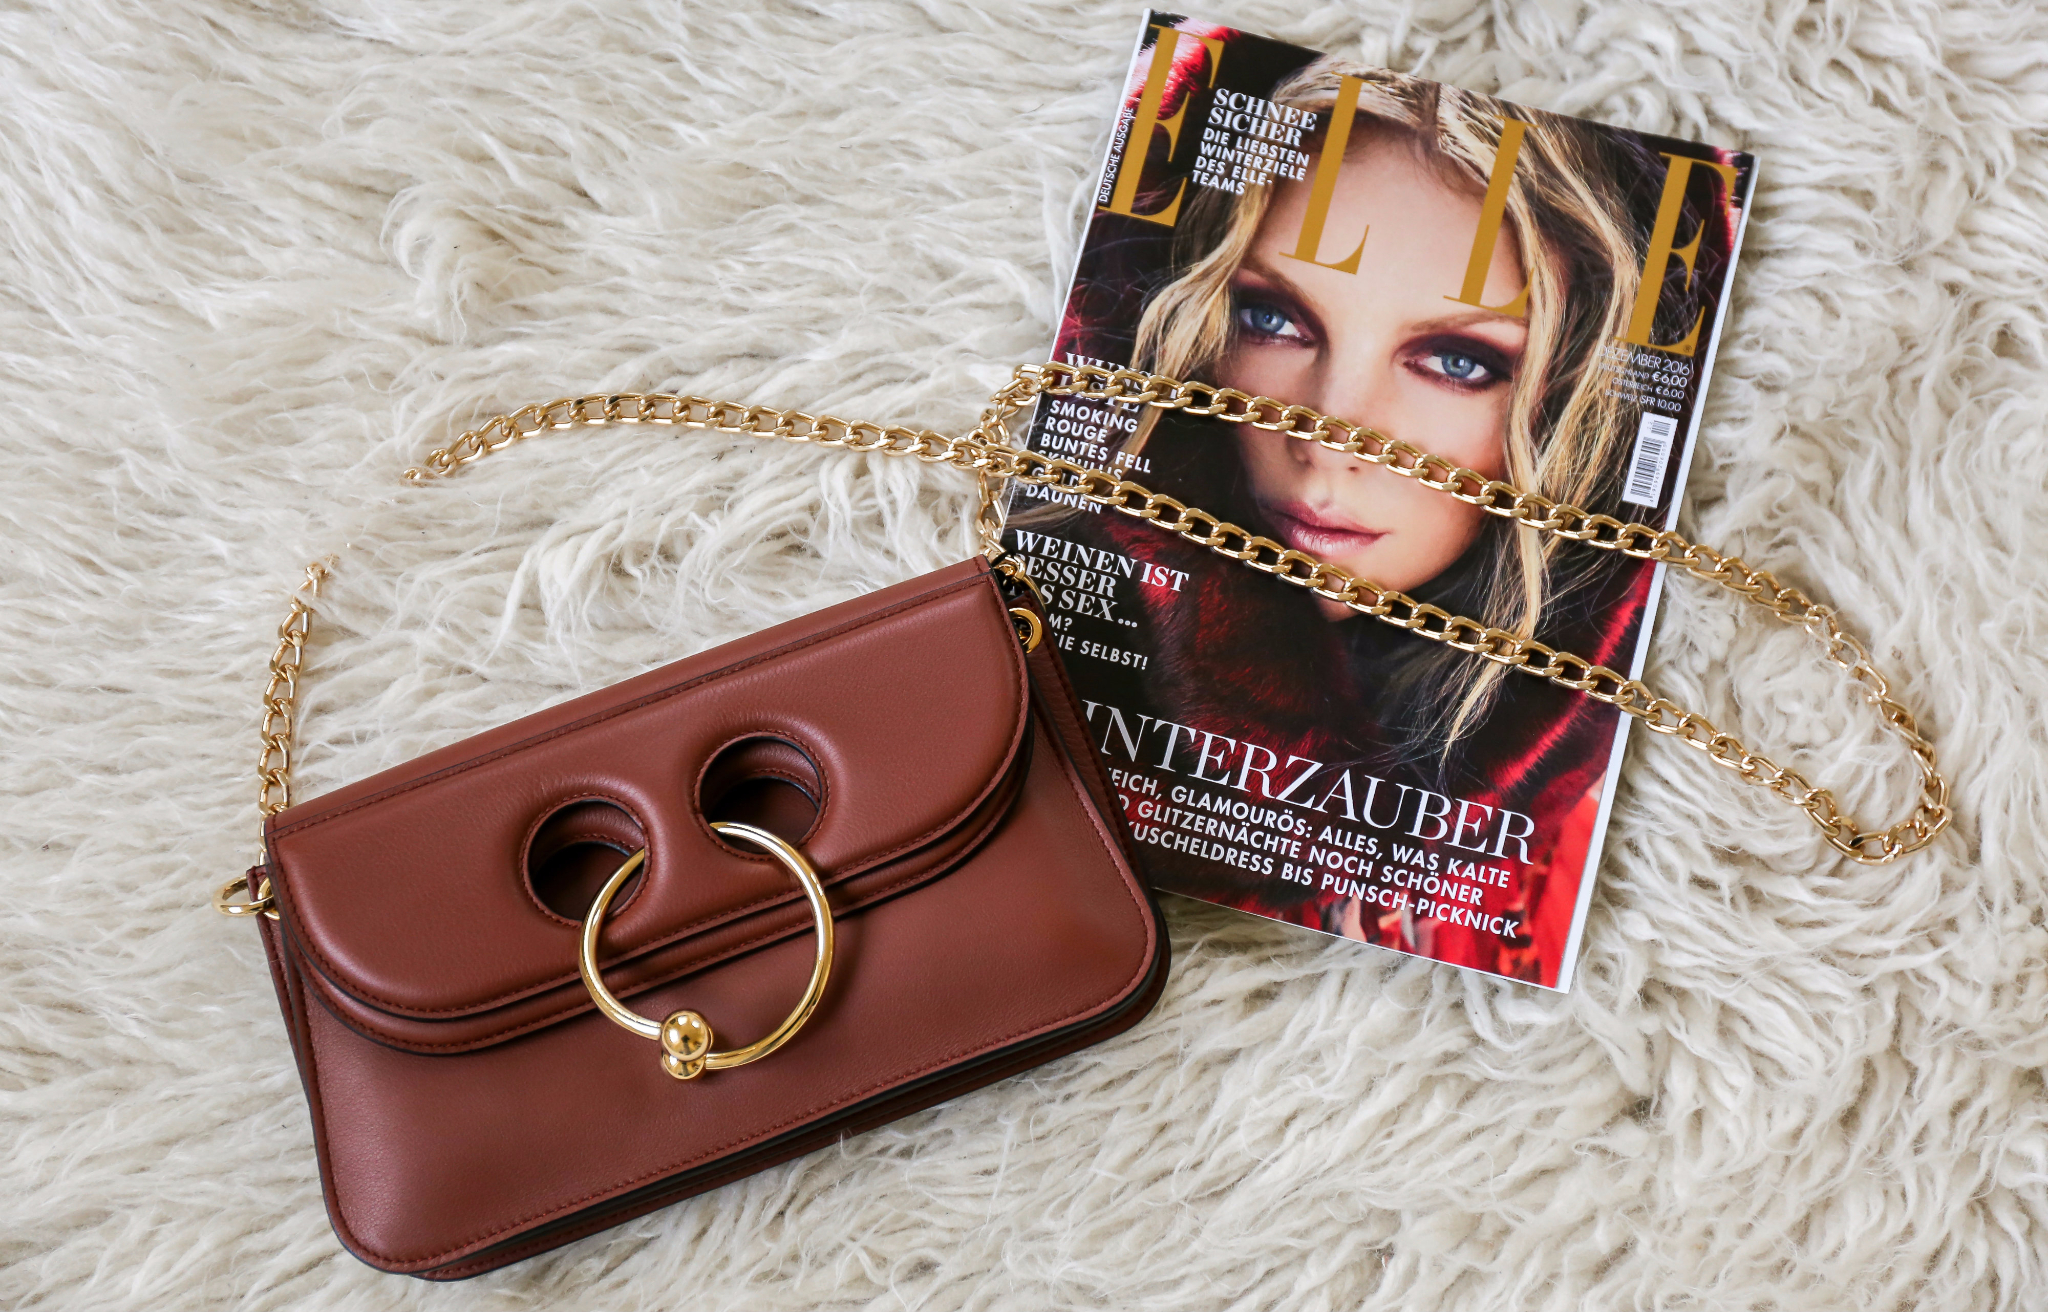 MOD-by-Monique-Fashion-Shopping-New-in-Pierce-Bag-JWAnderson-3-1